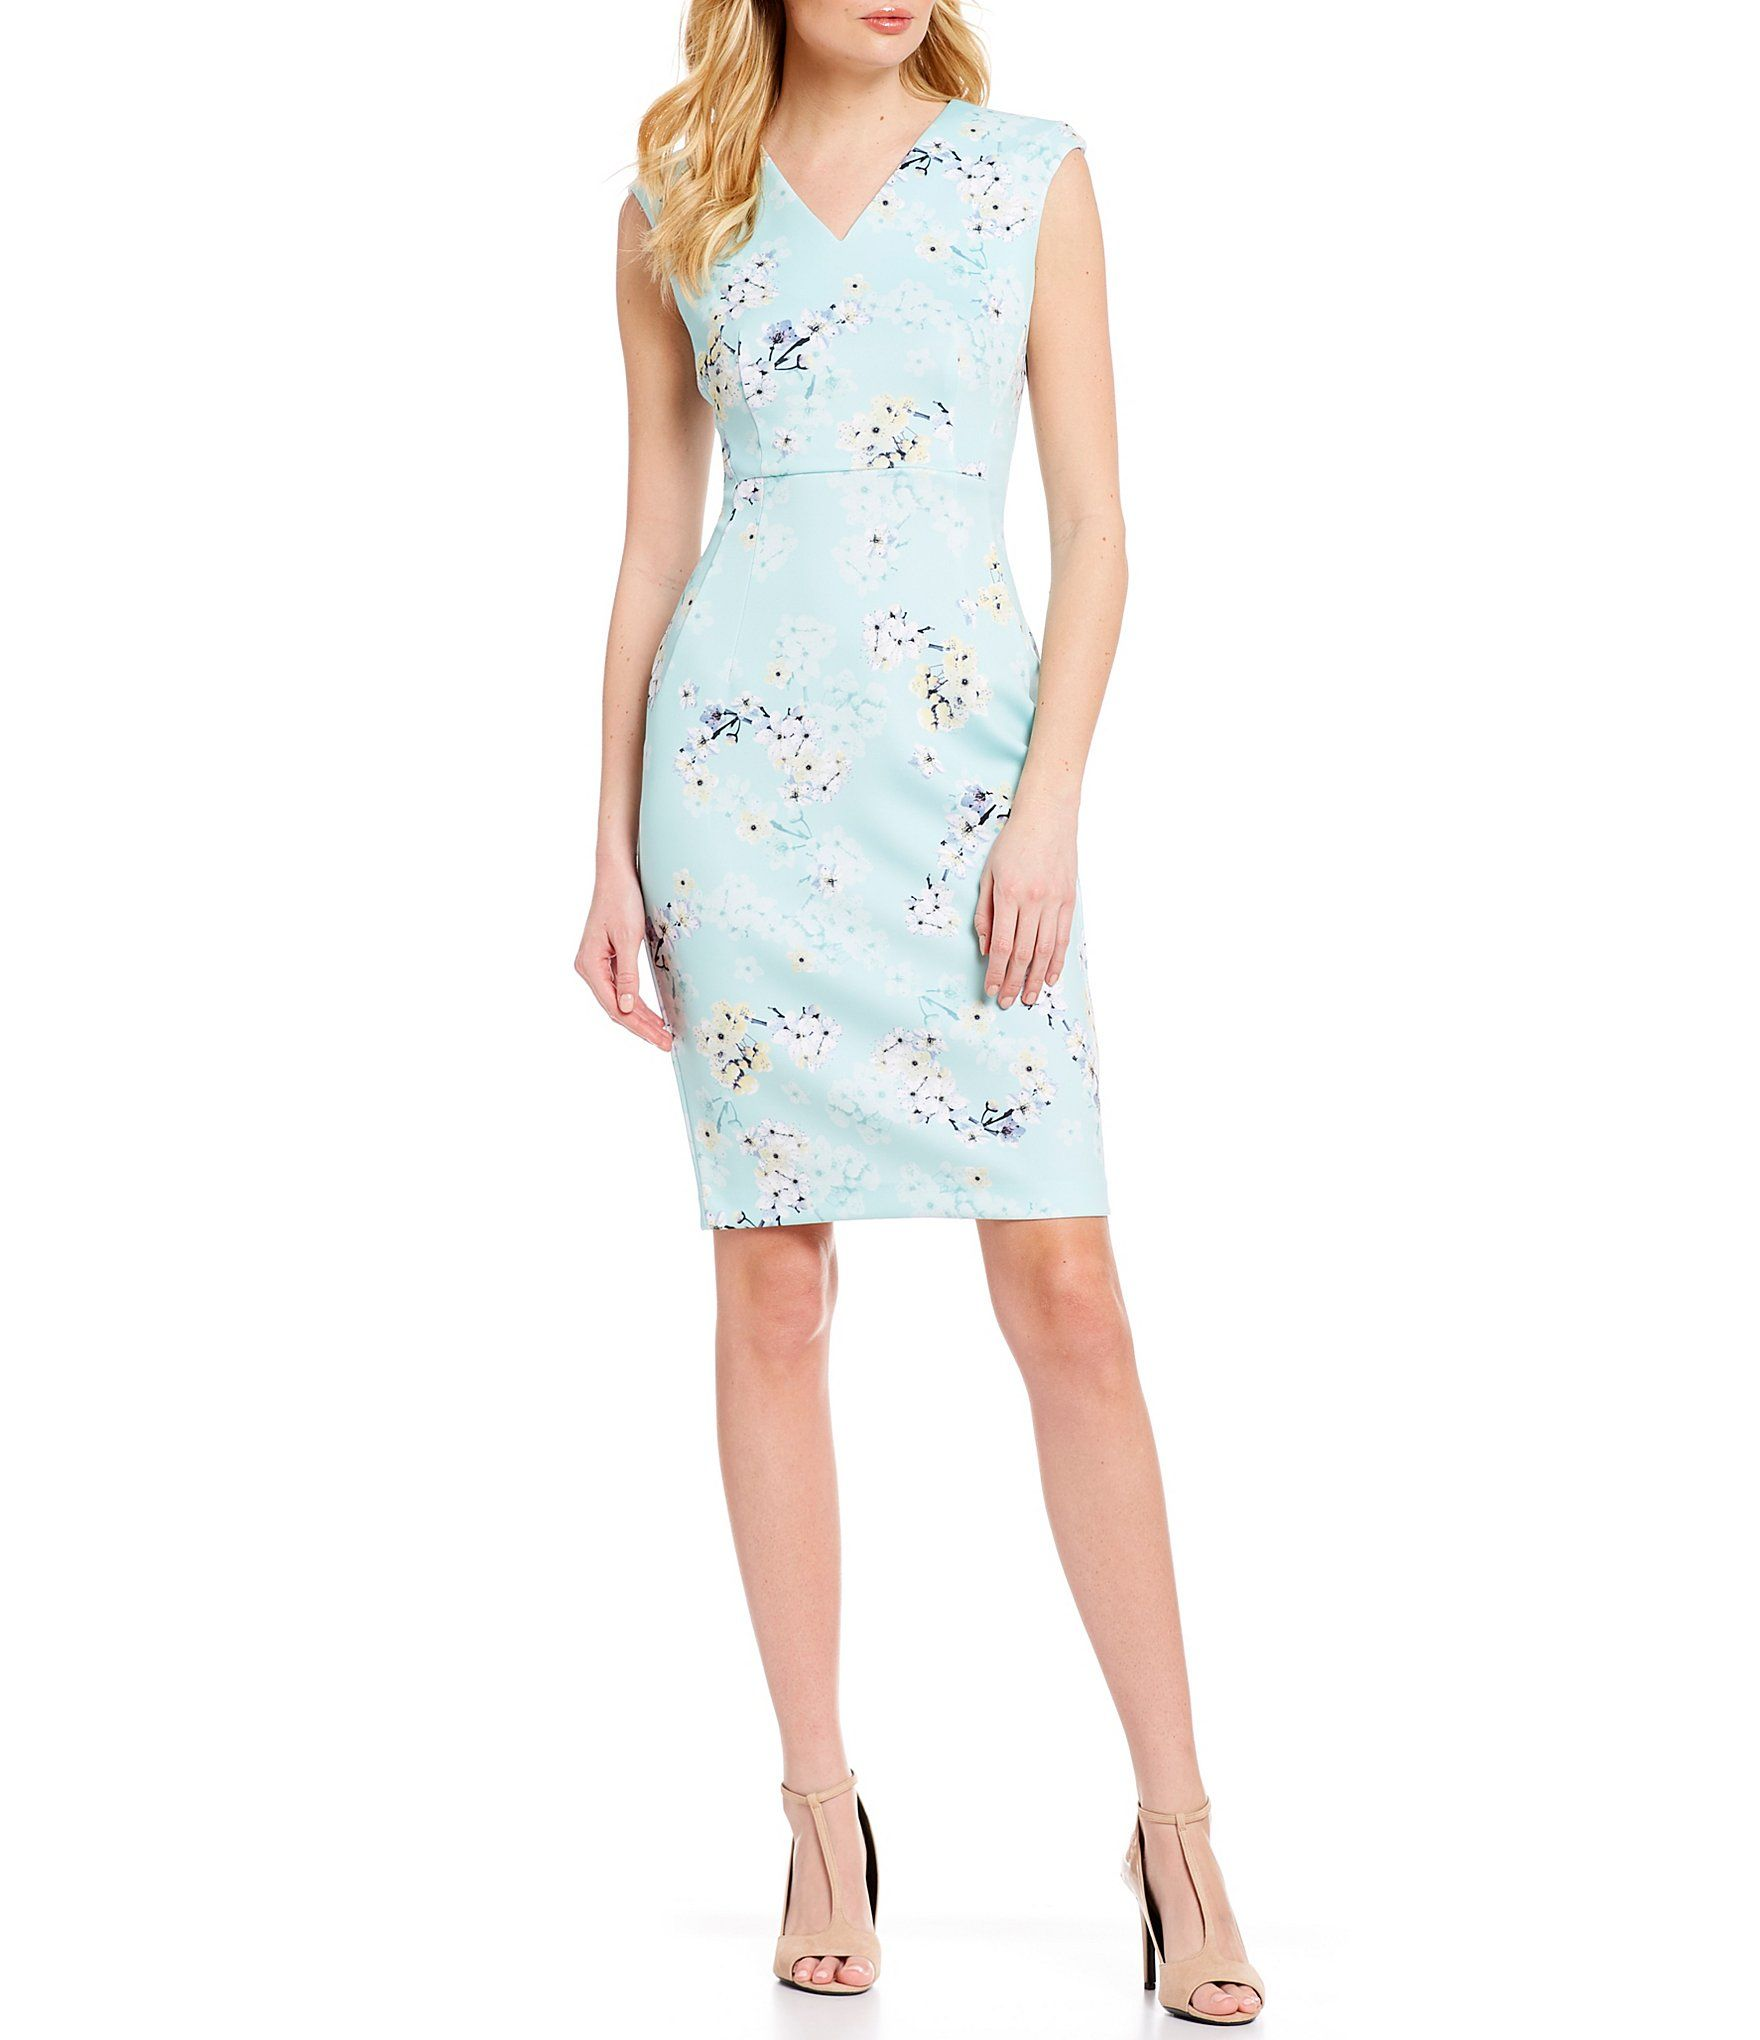 Calvin Klein Cherry Blossom Floral Print Sleeveless V Neck